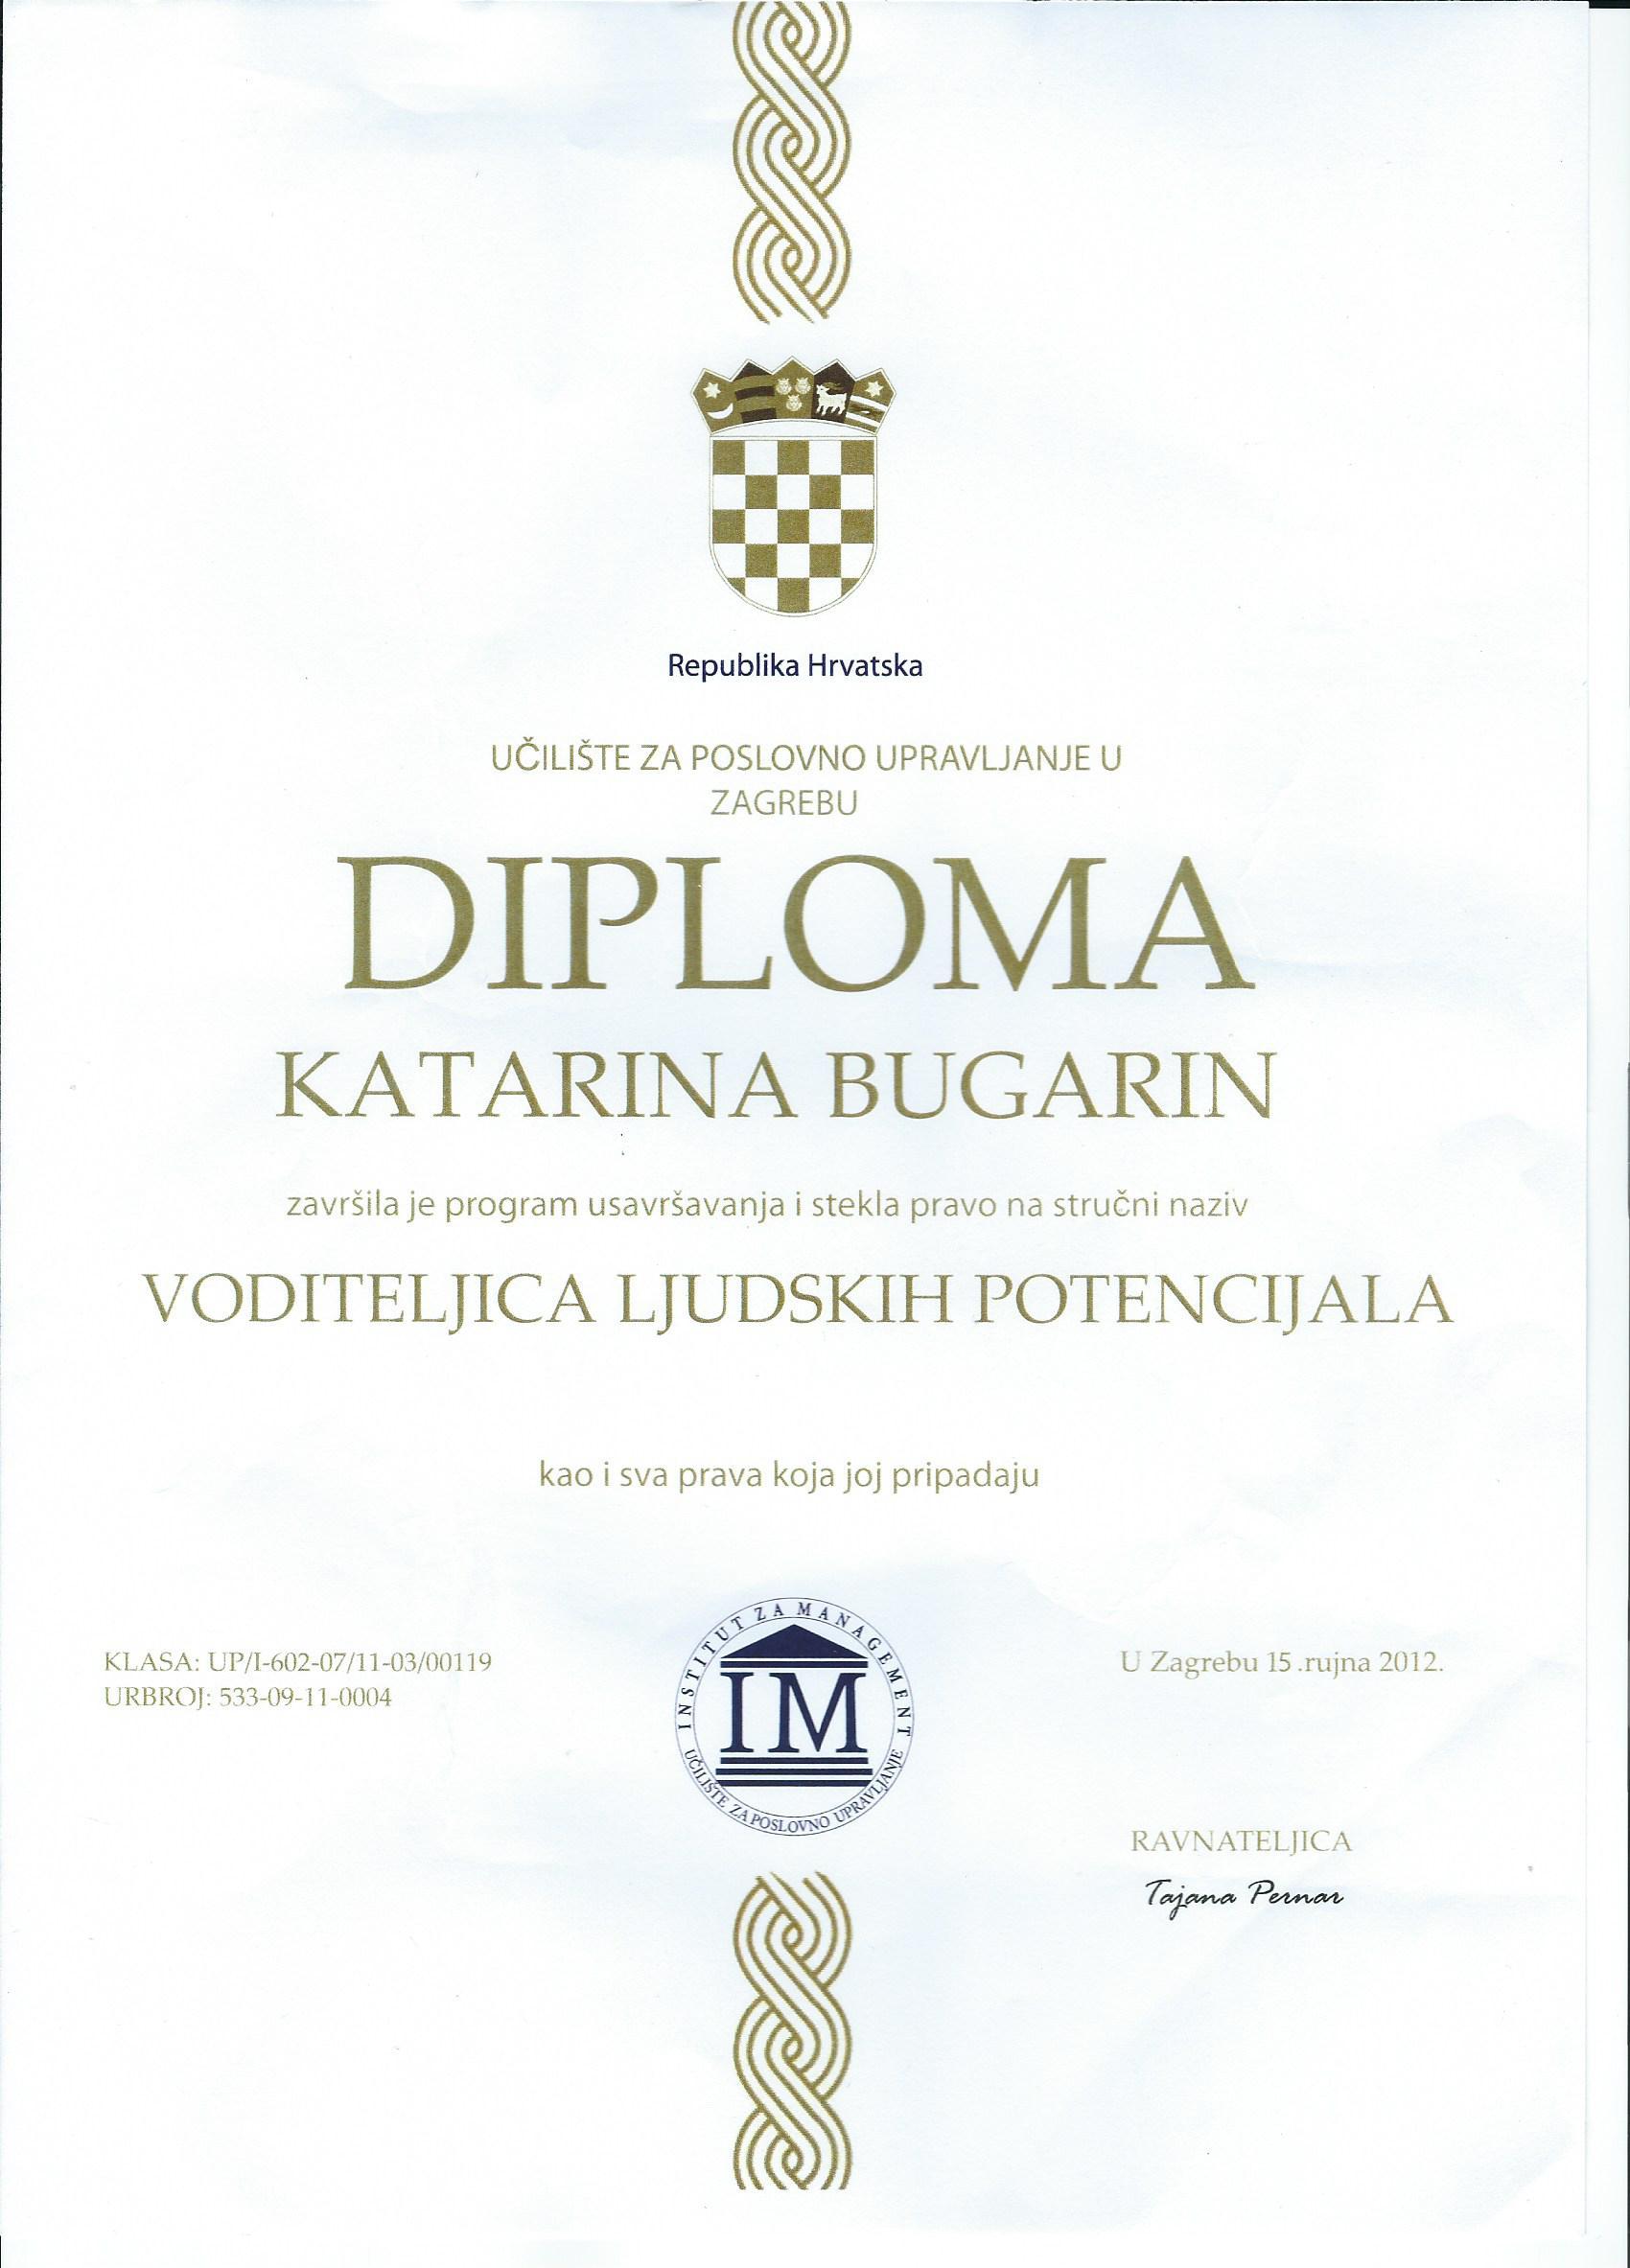 HR VODITELJ_KATARINA BUGARIN